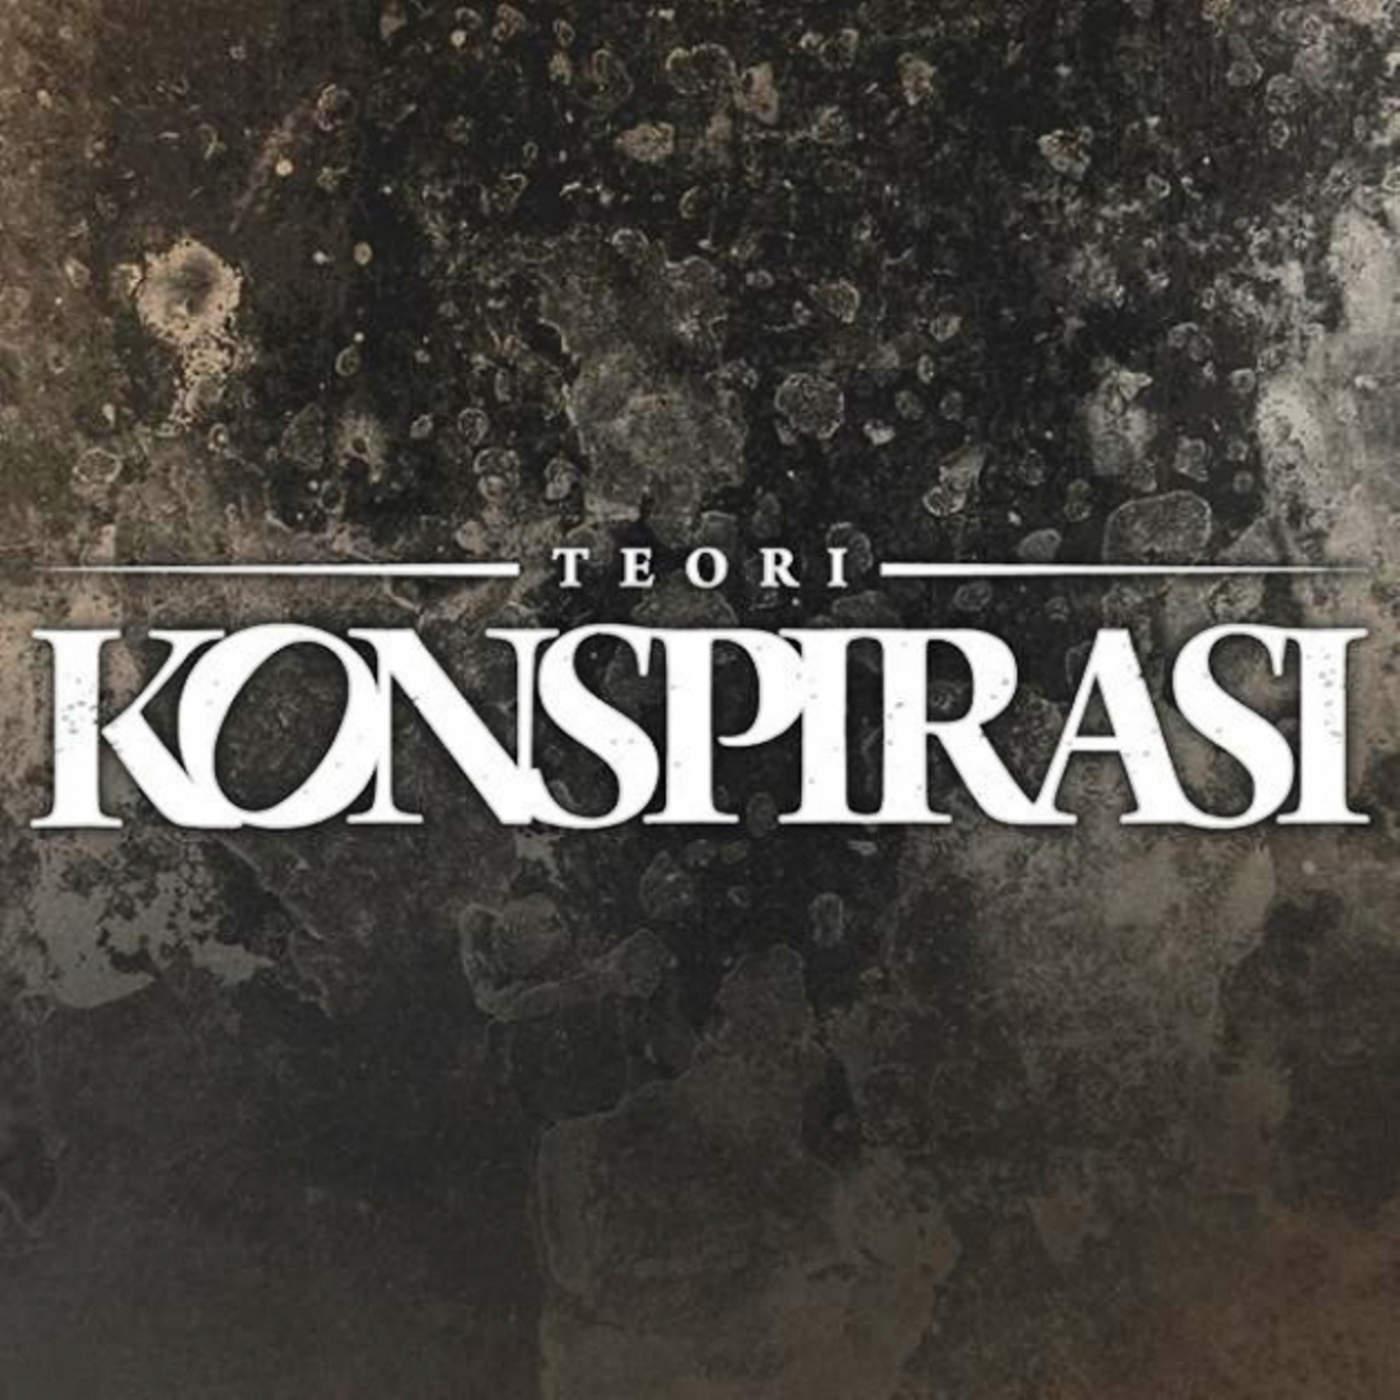 Konspirasi - Teori Konspirasi - Album (2012) [iTunes Plus AAC M4A]